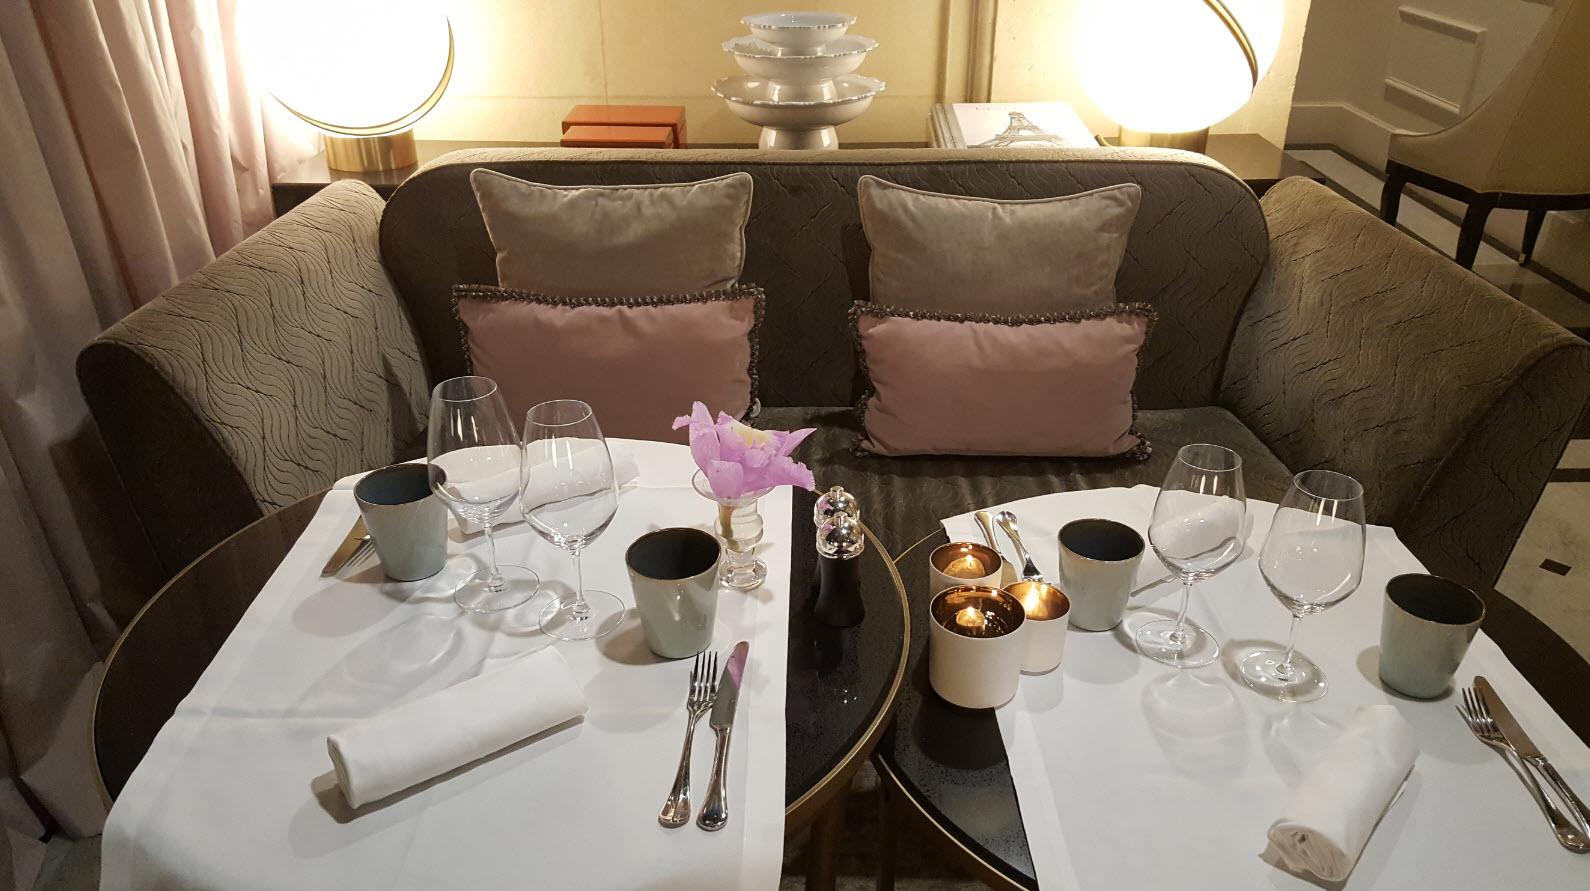 Diner dans cadre elegant et romantique